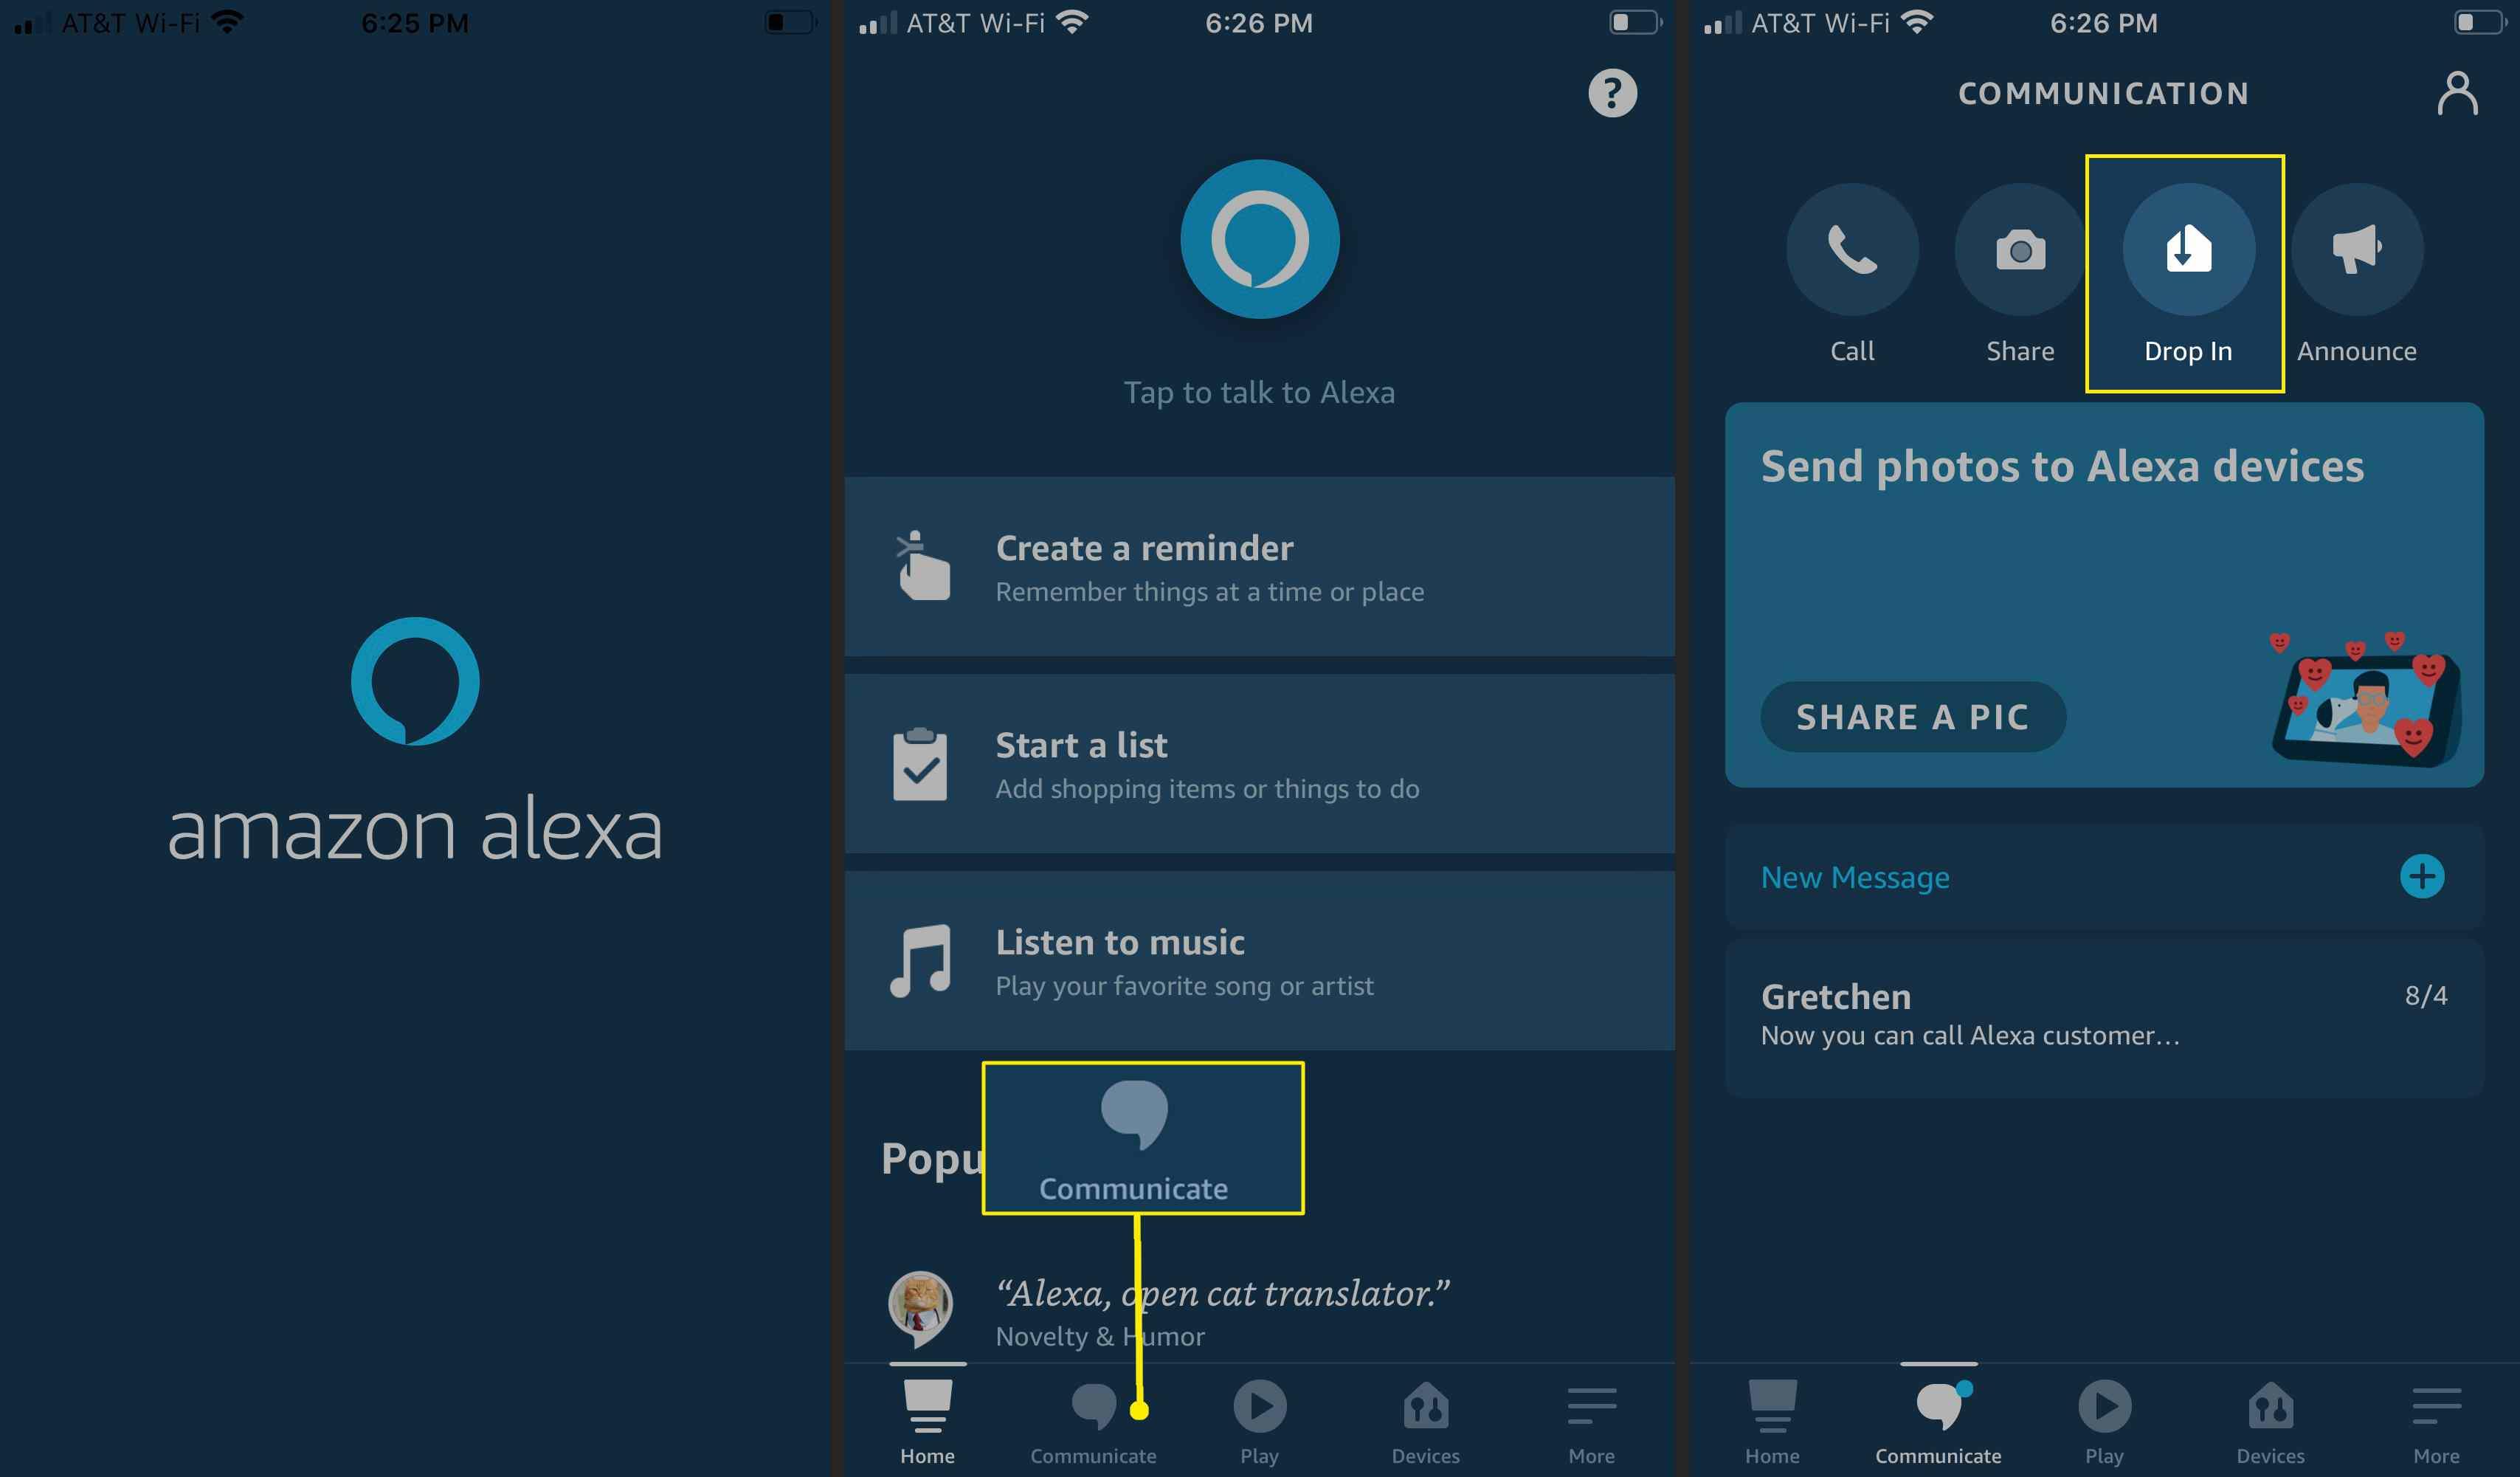 Set up Drop In on the Alexa App